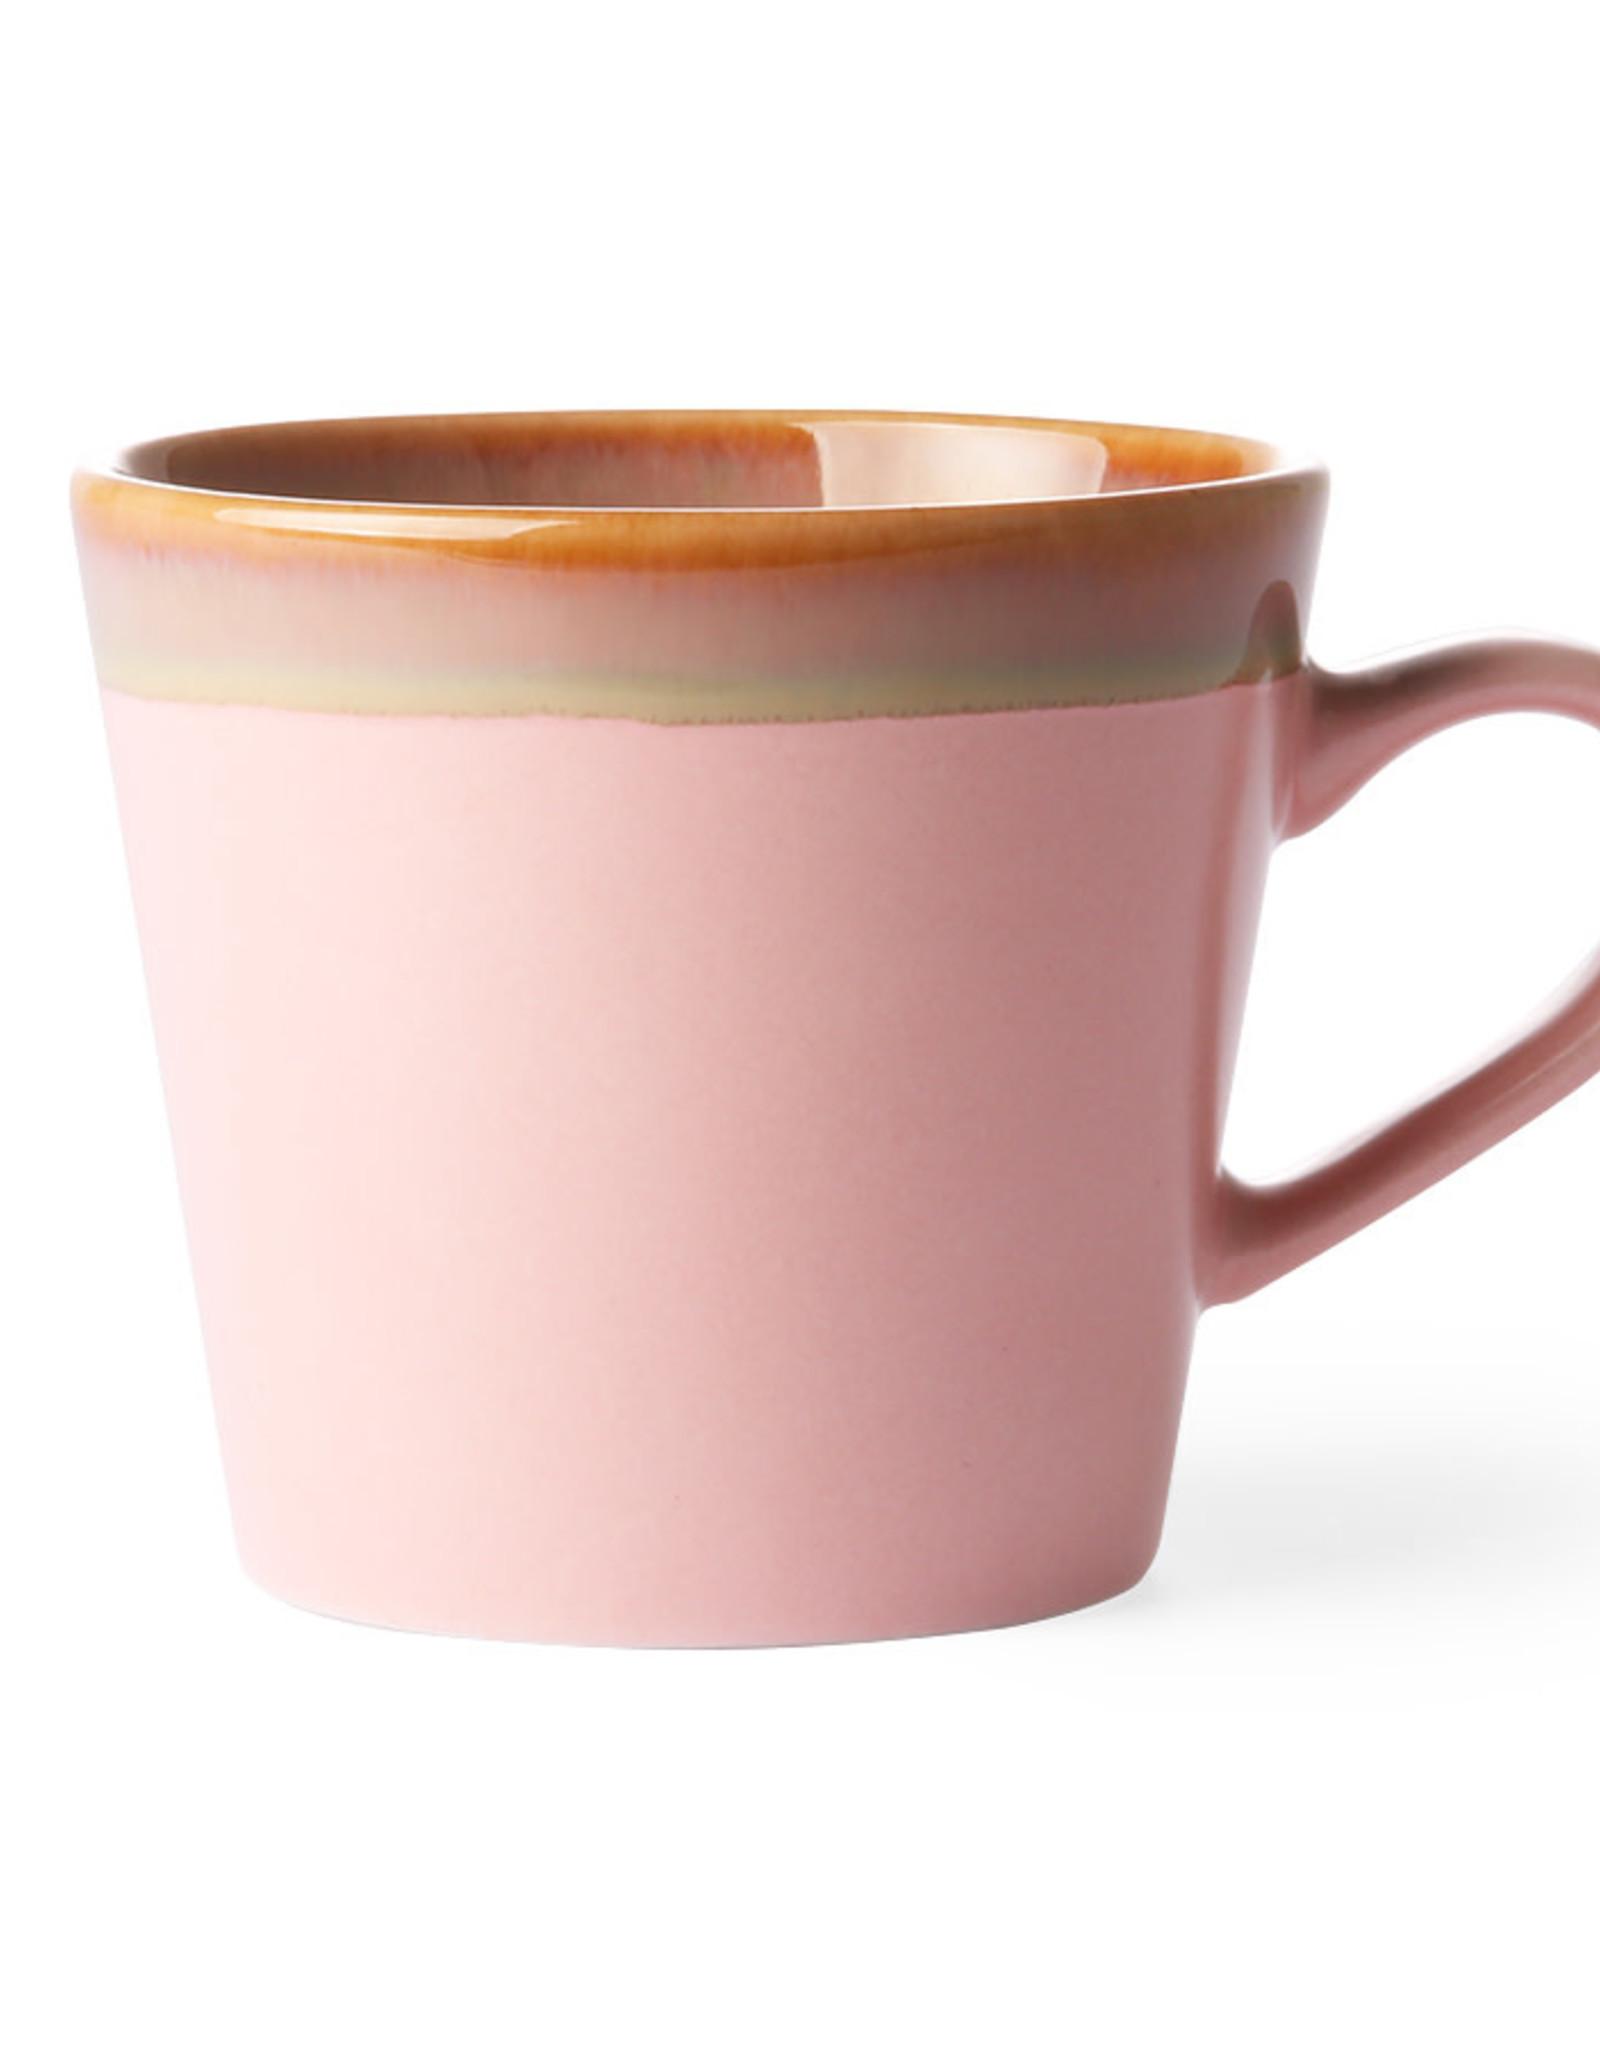 HKliving HKliving 70's Ceramics Cappuccino Mug Pink